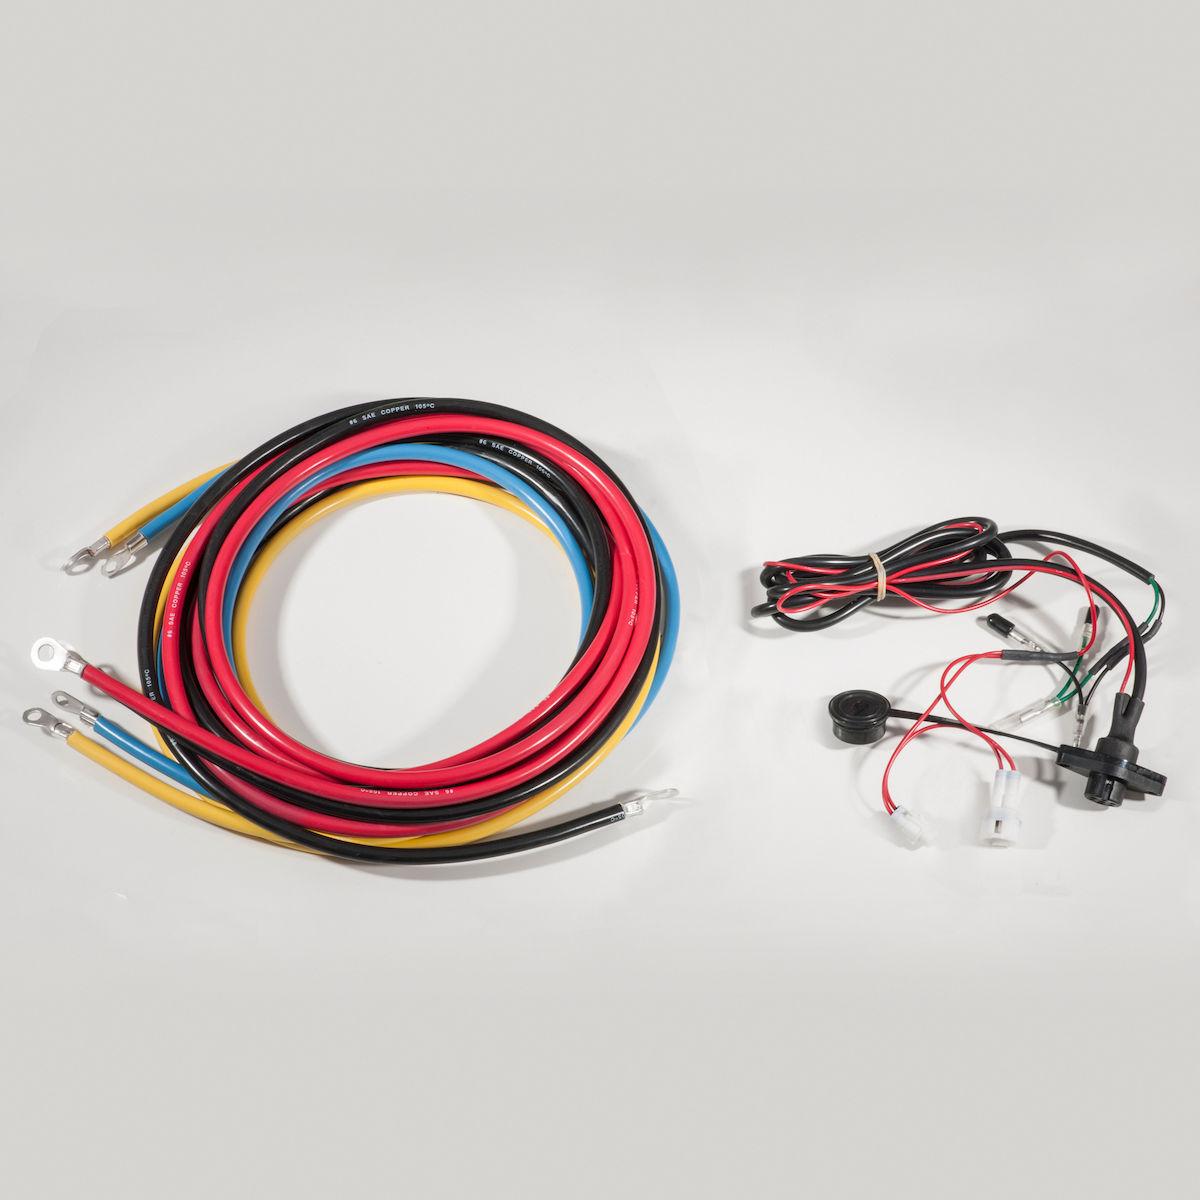 Wondrous Winch Wiring Kit 2Hc F28M0 V0 00 Yamaha Motor Wiring 101 Capemaxxcnl